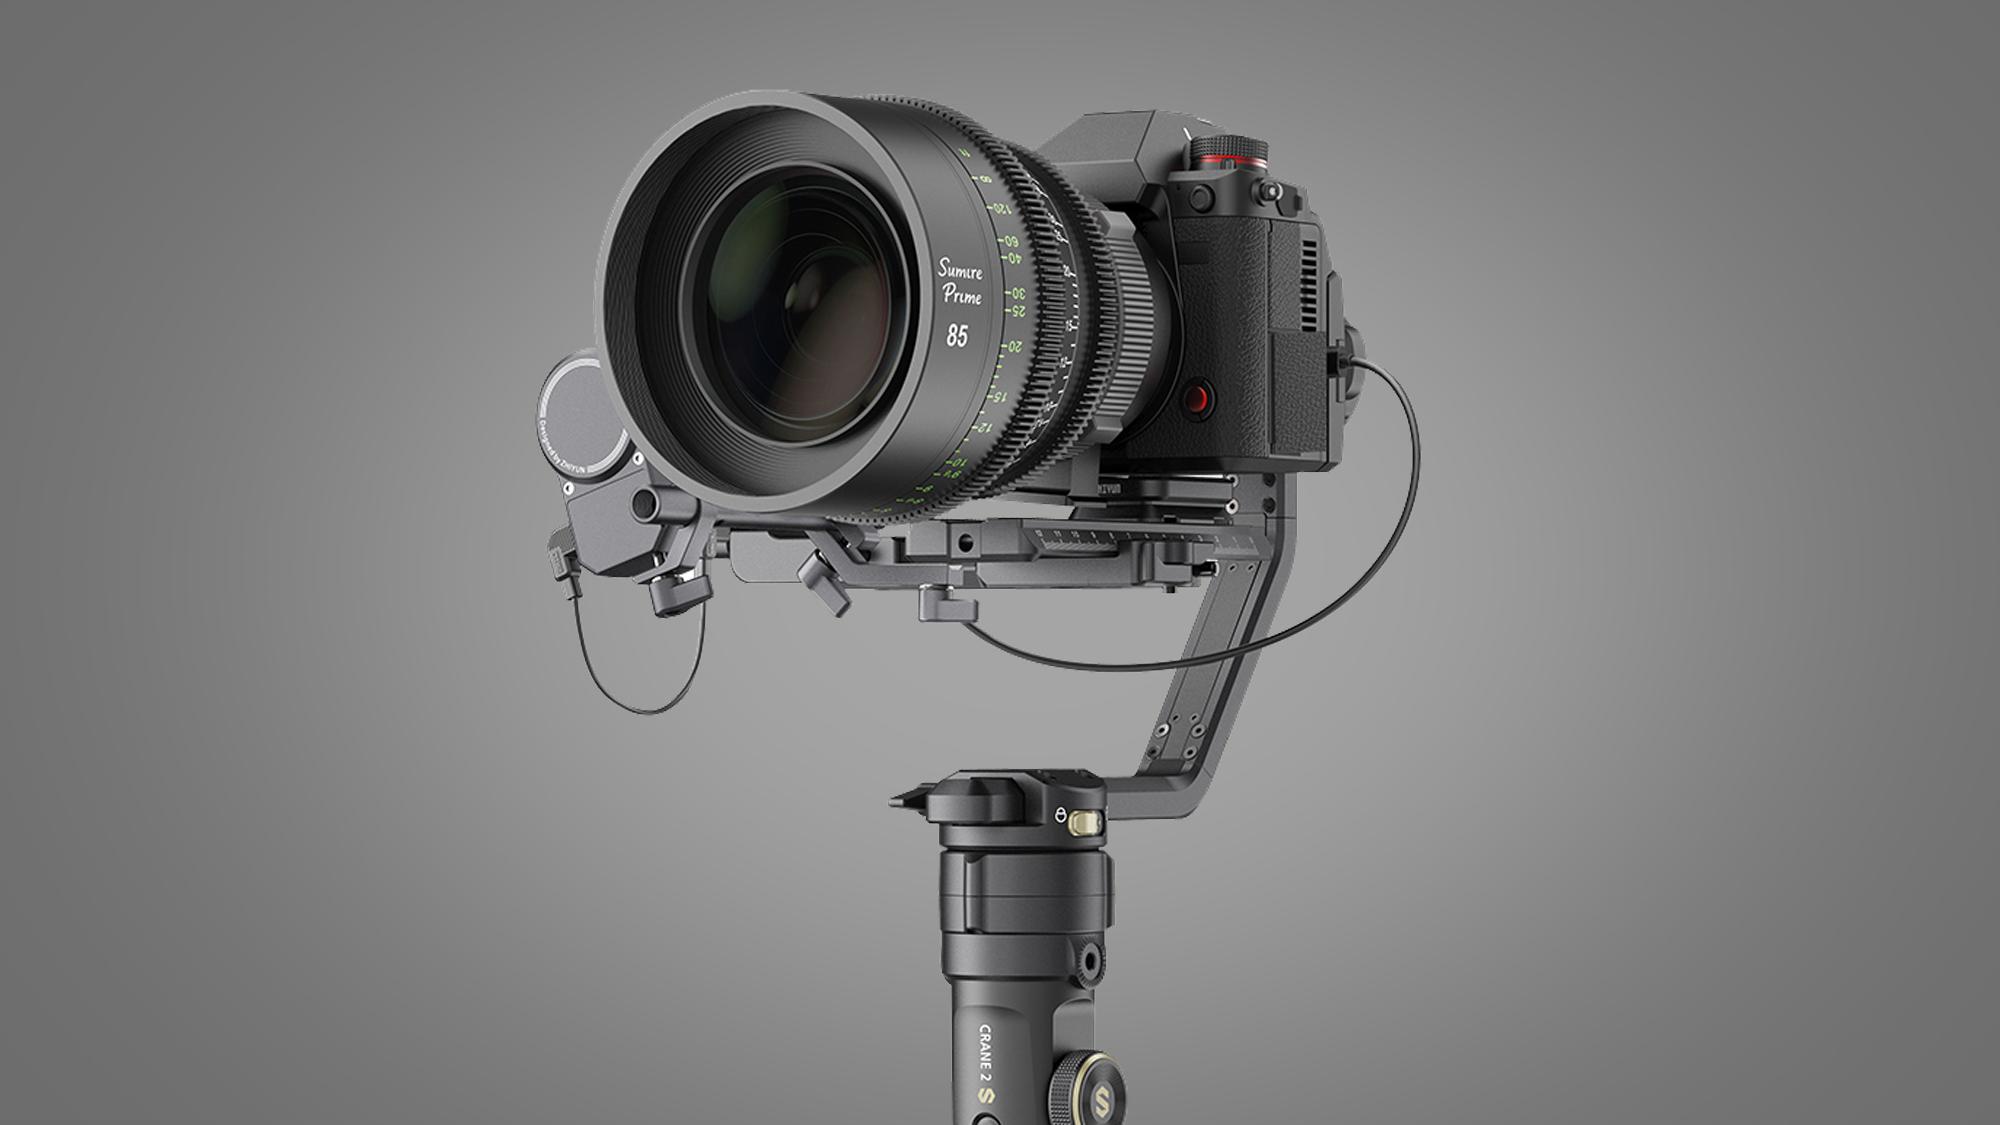 The Zhiyun Crane 2S gimbal holding a camera